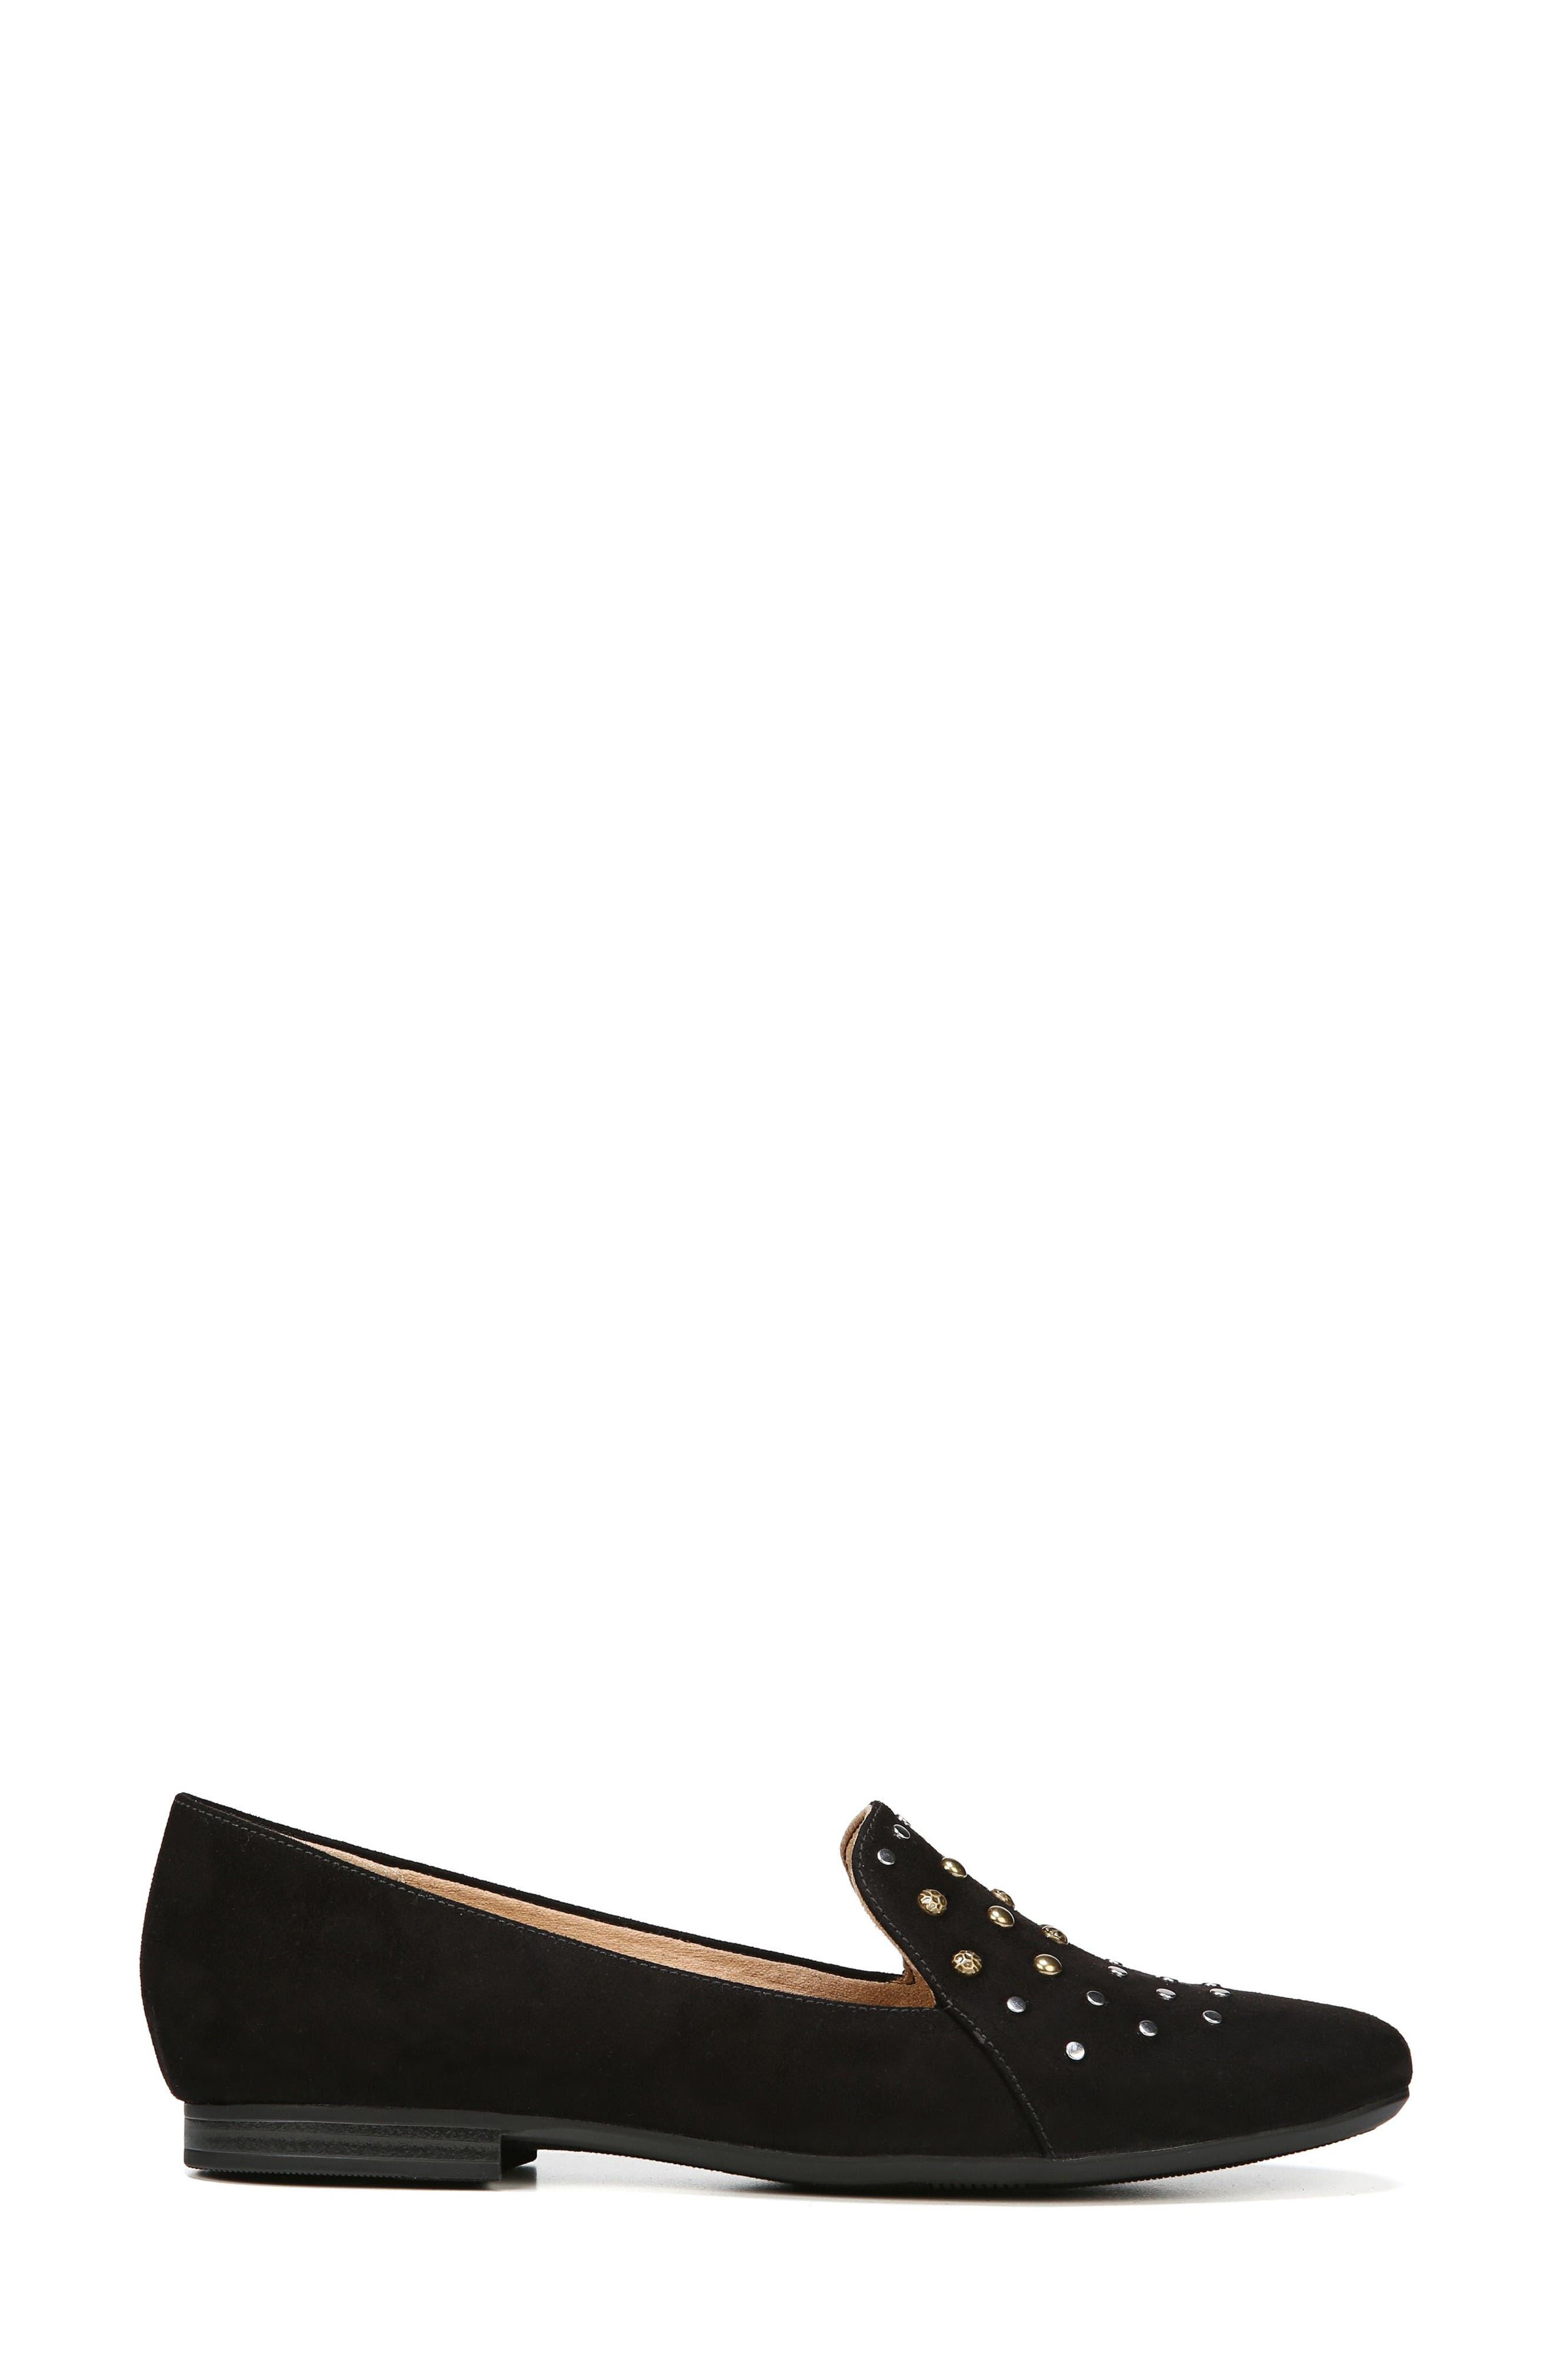 Emiline 4 Loafer,                             Alternate thumbnail 4, color,                             Black Fabric